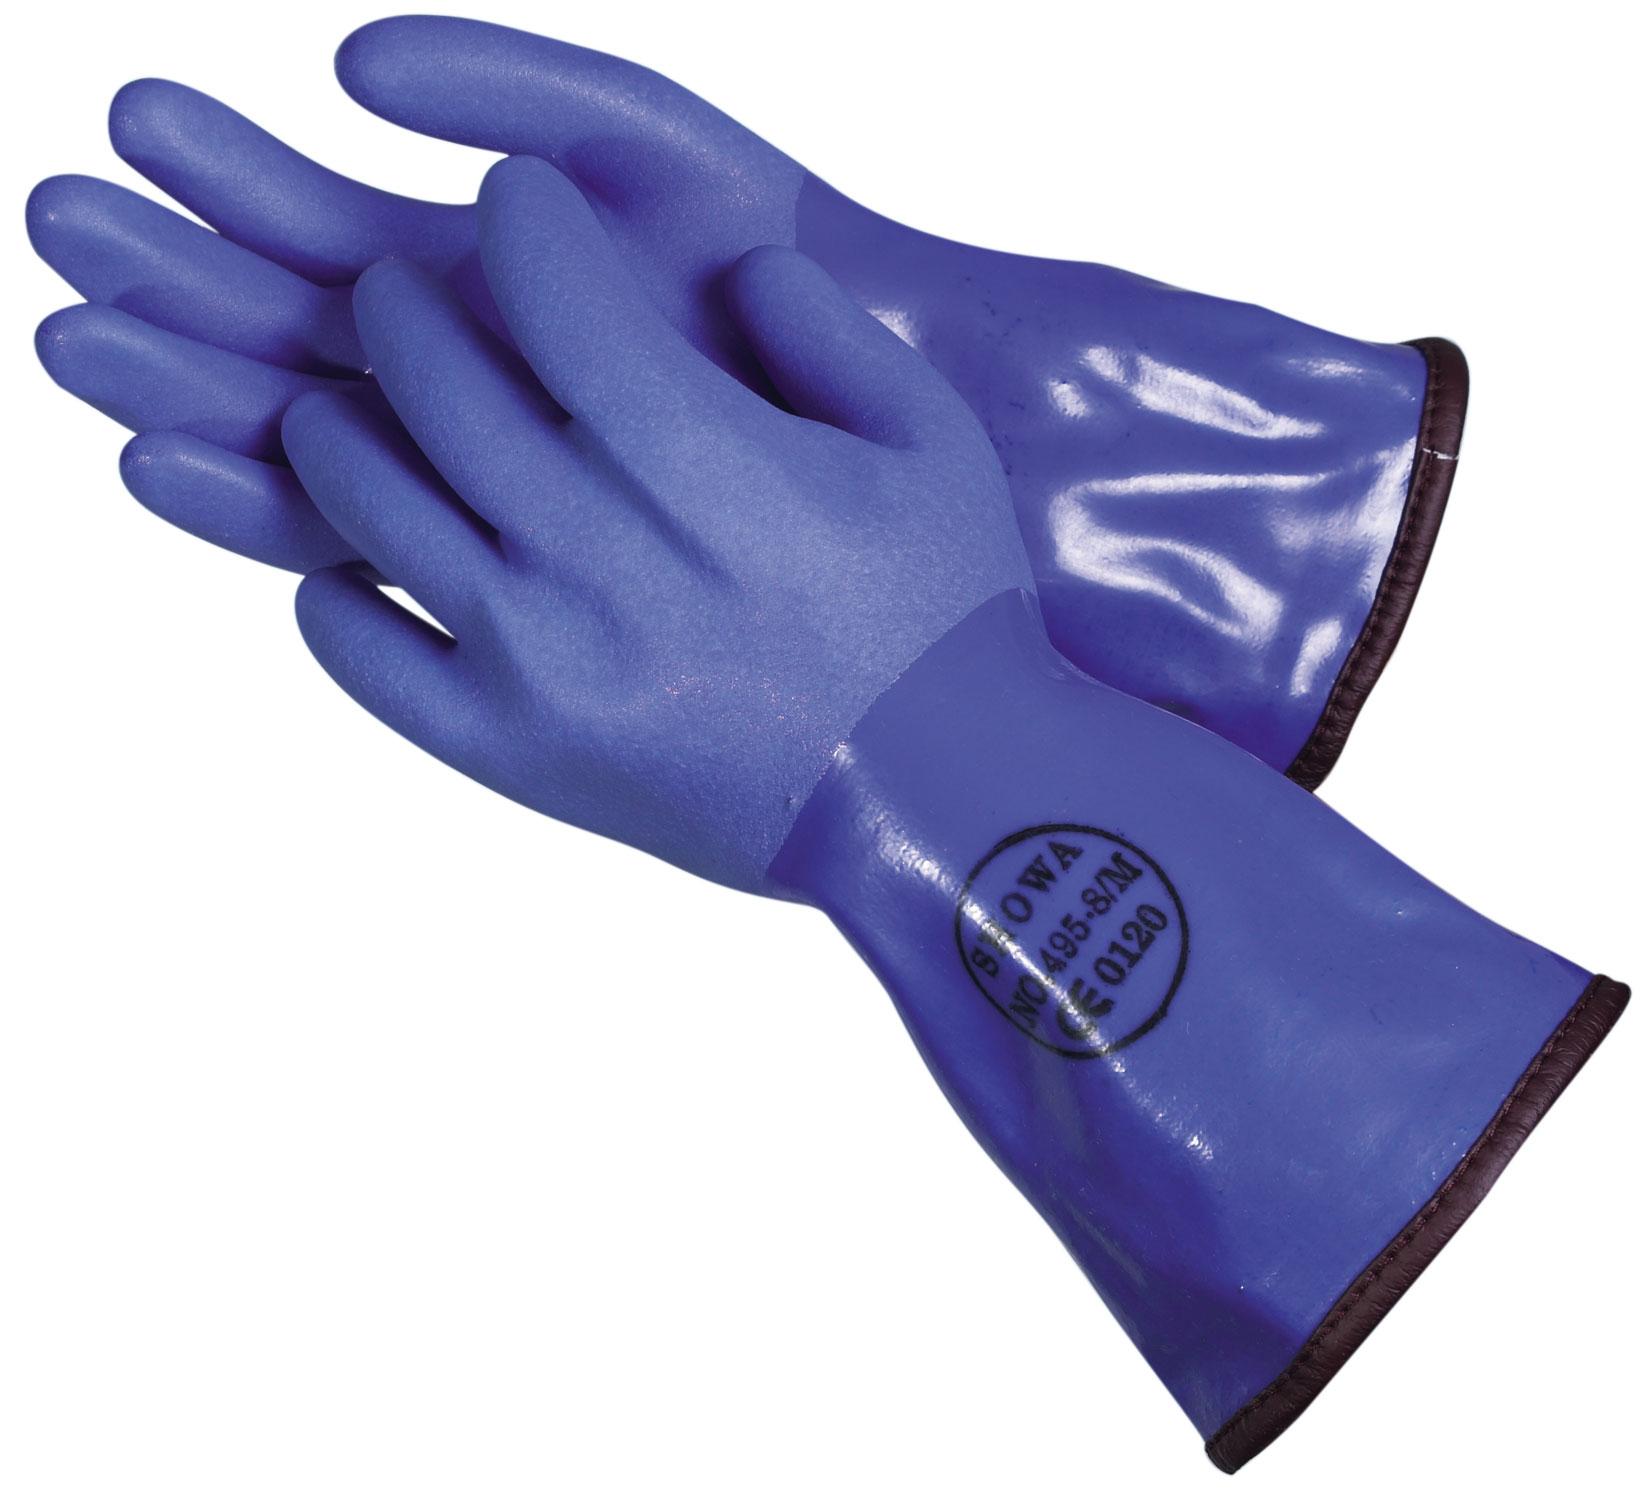 Trockenhandschuhe für Ringsystem set